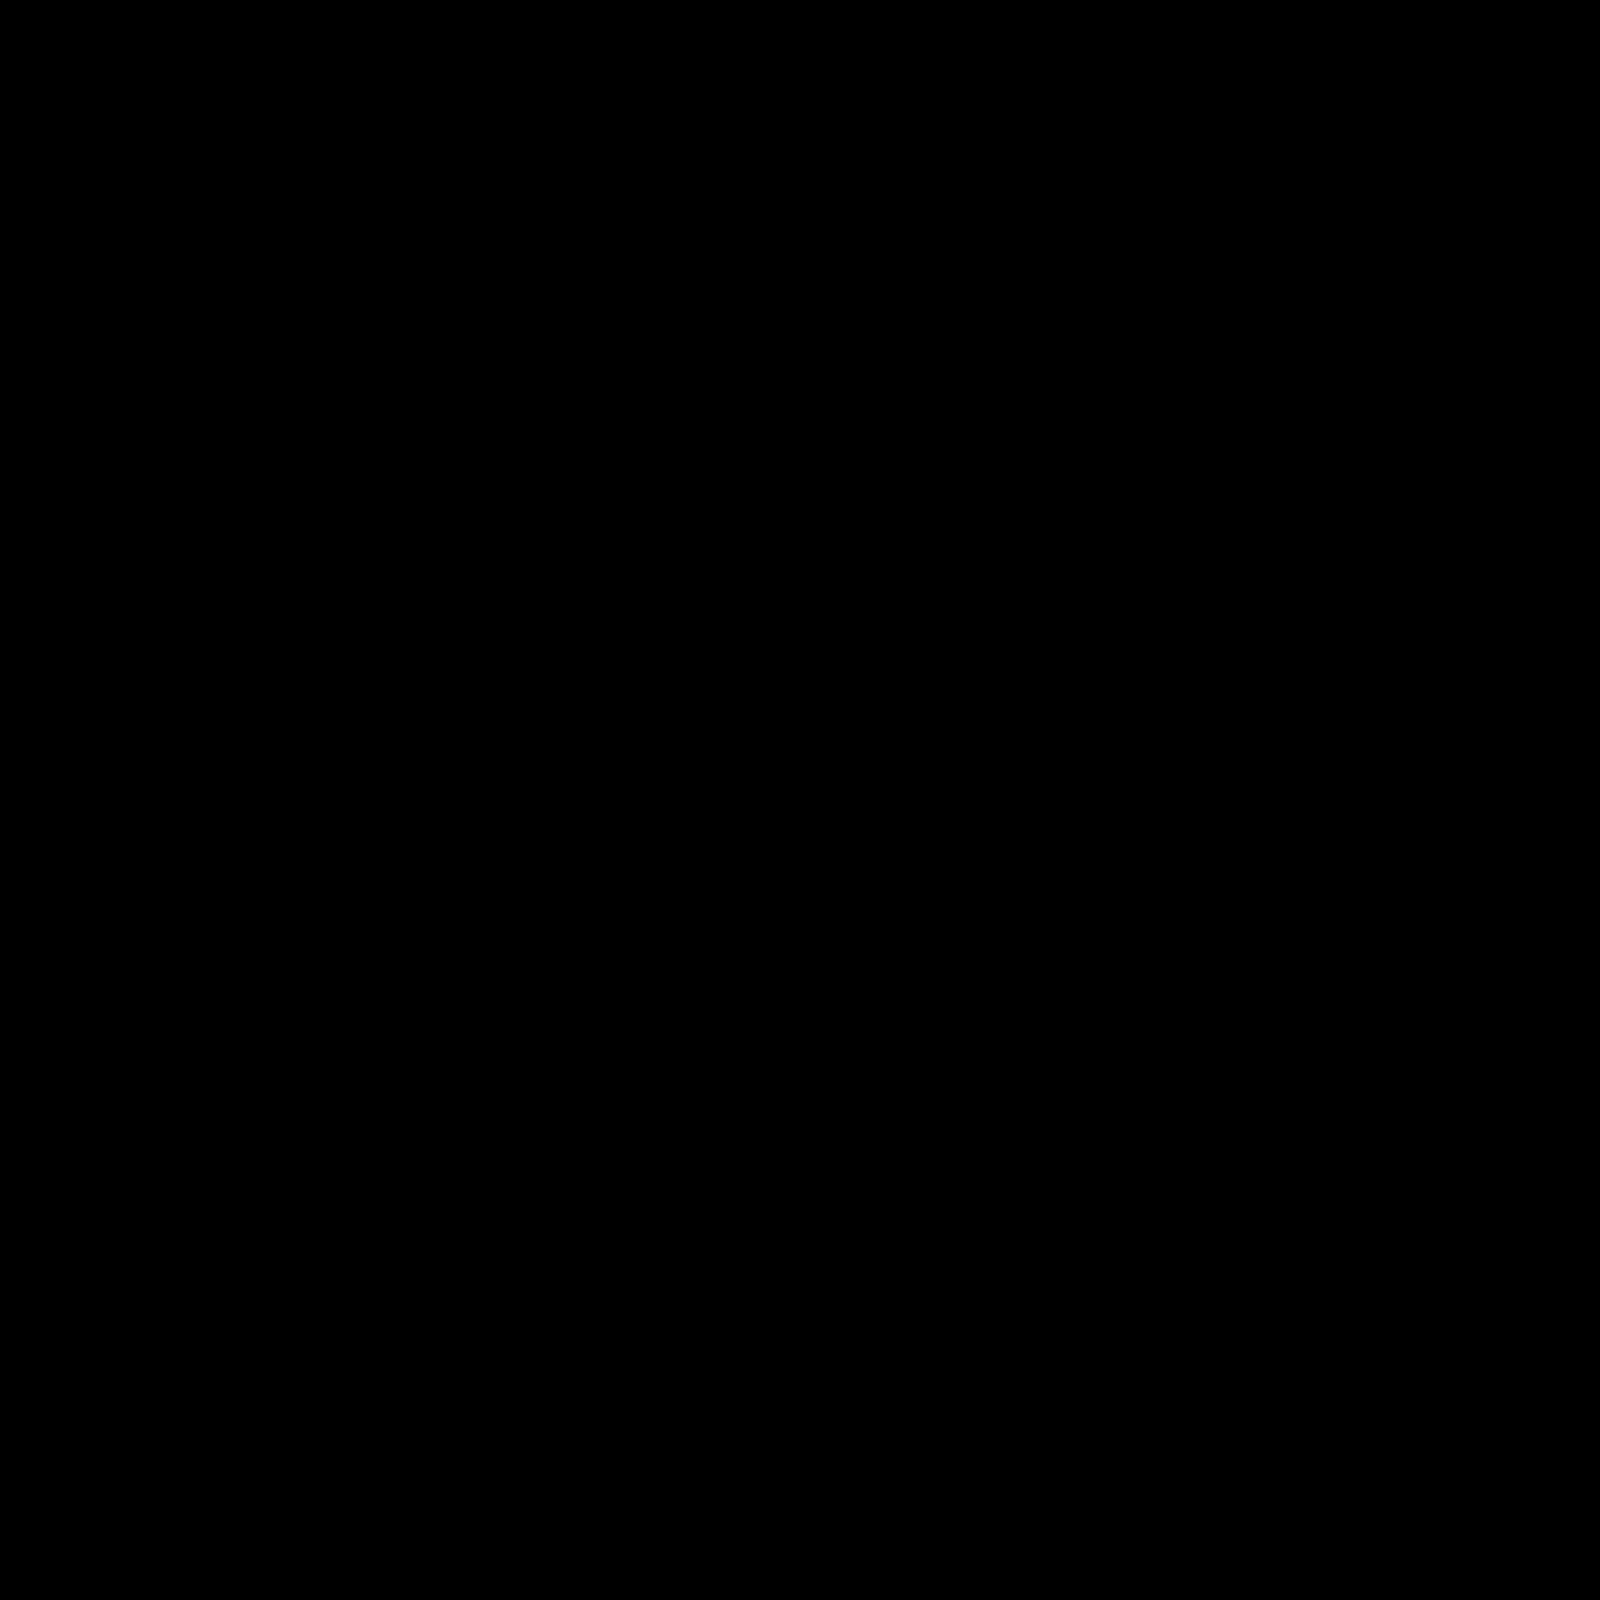 Abrir currículum icon